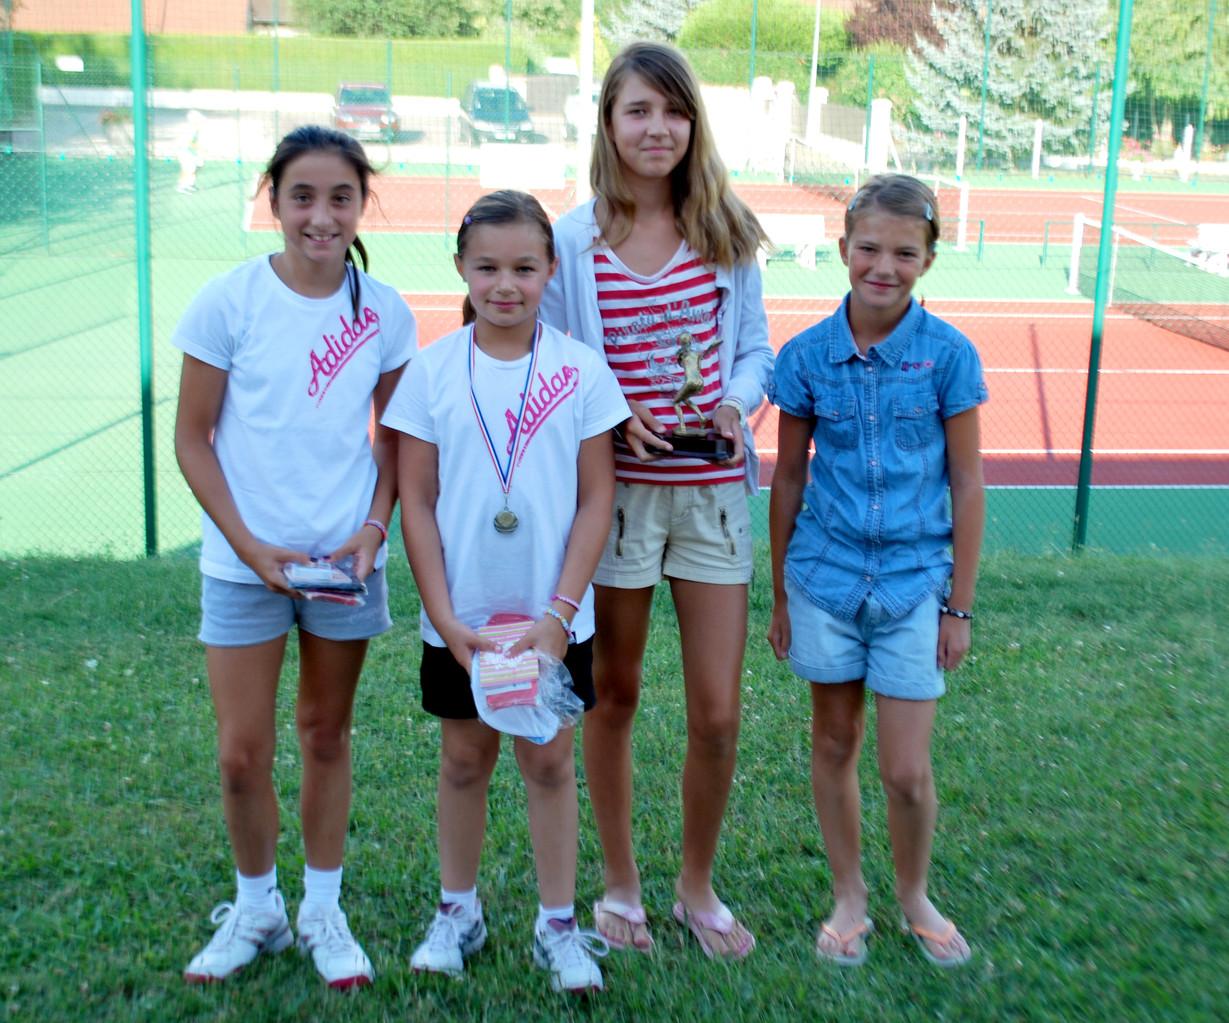 De g. à d. Lily Jacob, Atalia Gaudichon, Alice Pointu (gagnante), Elodie Lafond (manque Elsa Blanc)